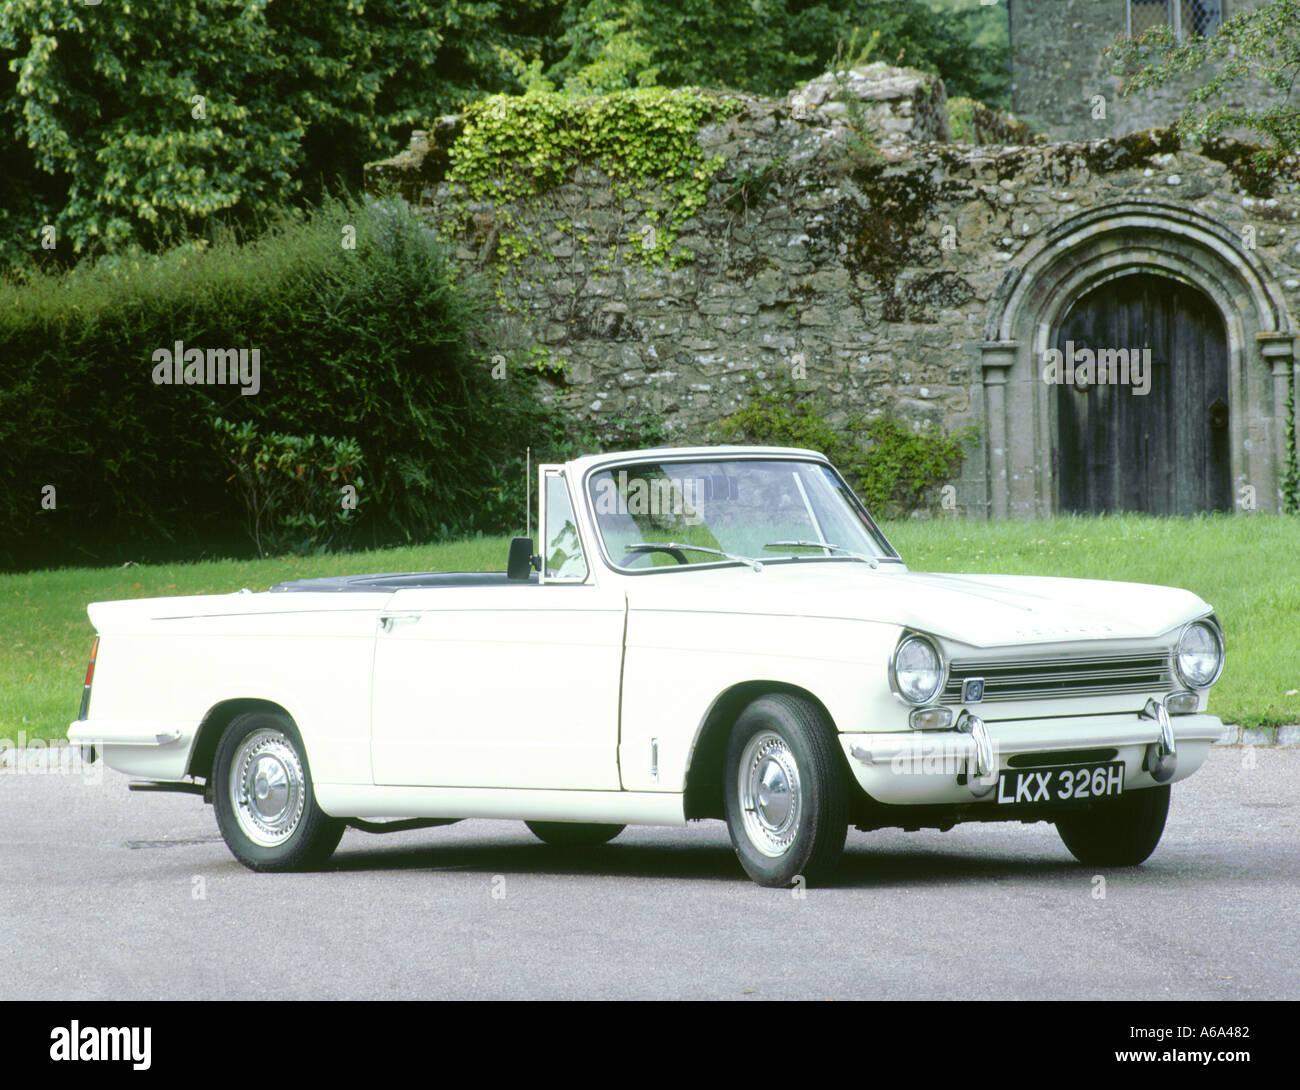 1968 Triumph Herald 1360 convertible - Stock Image